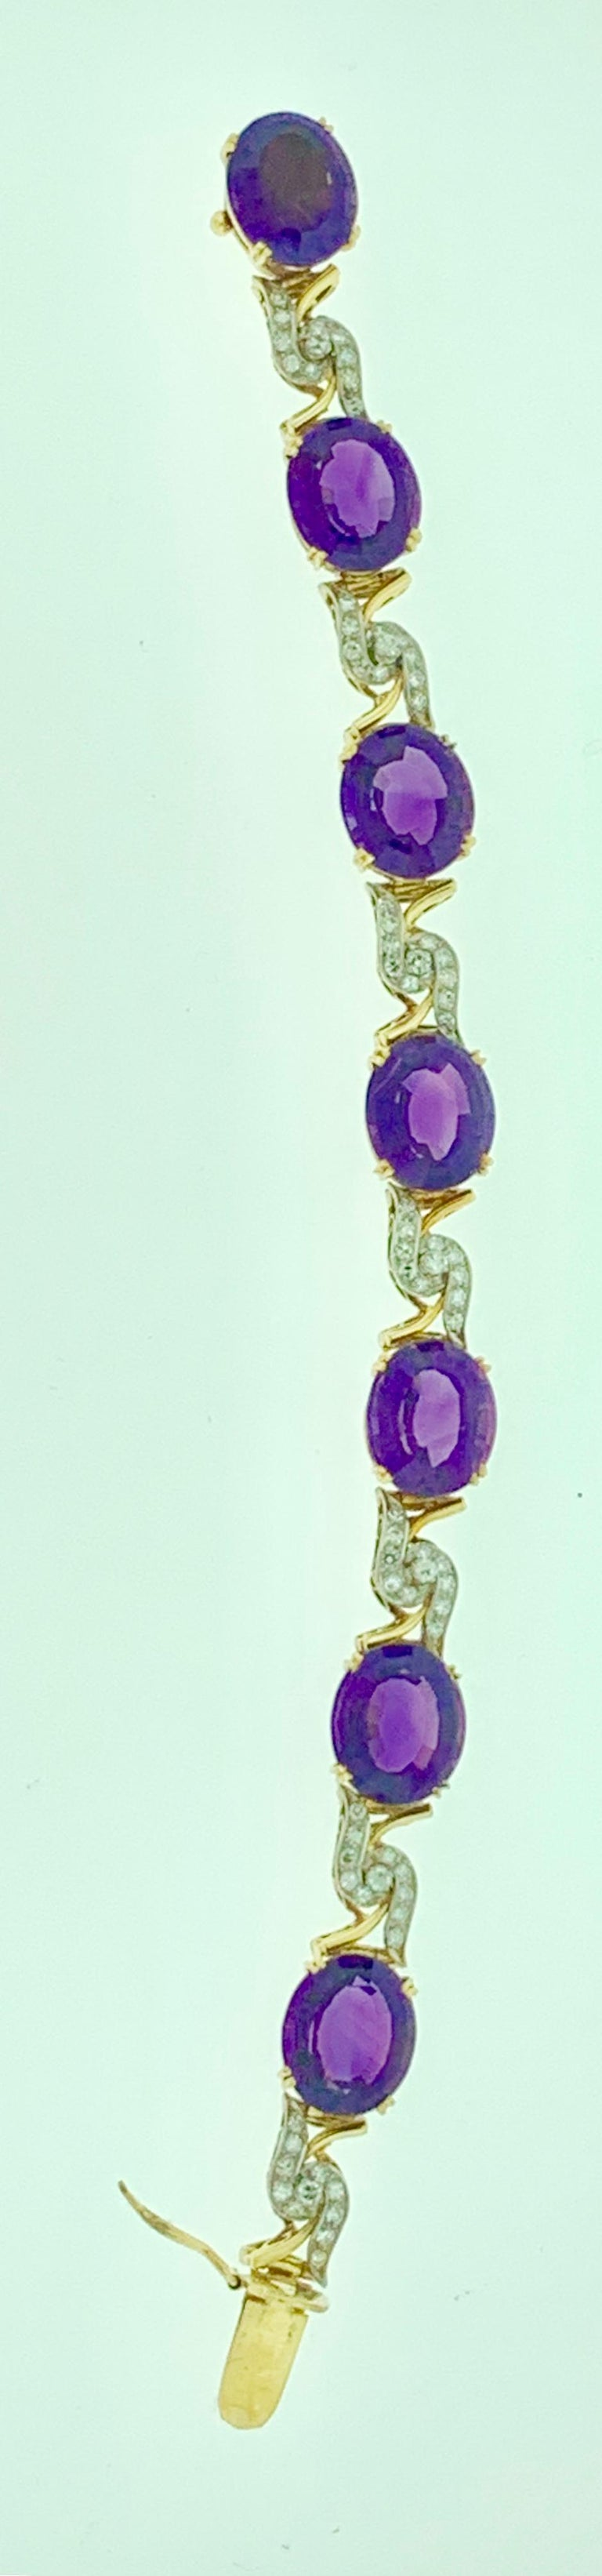 52 Carat Oval Amethyst and Diamond Bracelet in 18 Karat Yellow Gold For Sale 4